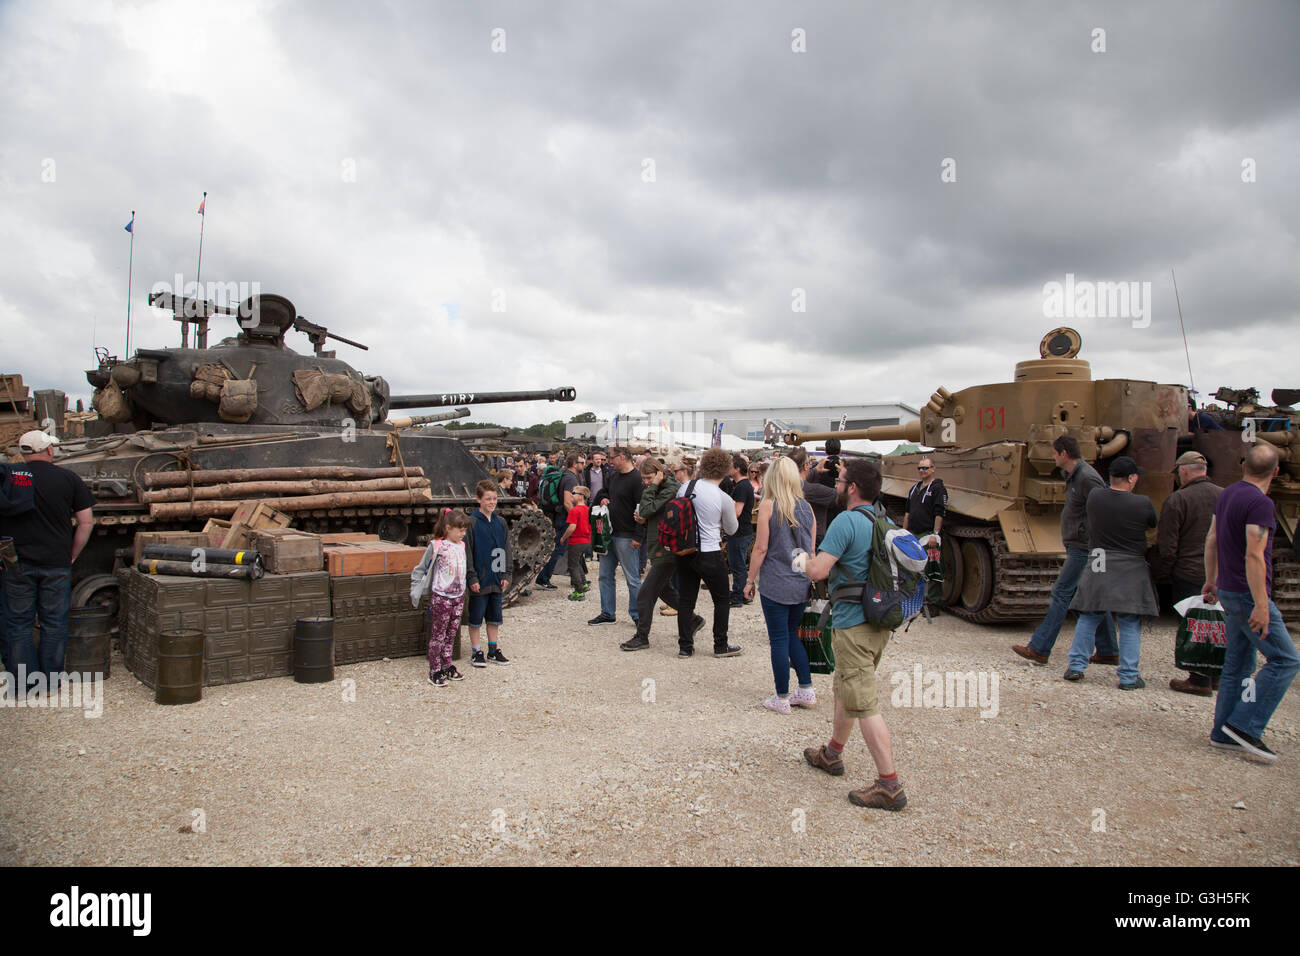 Bovington, Dorset, UK. 25 juin 2016. Tankfest show militaire. American Sherman M4A2E8 (FURY) et l'Allemand Tiger Photo Stock